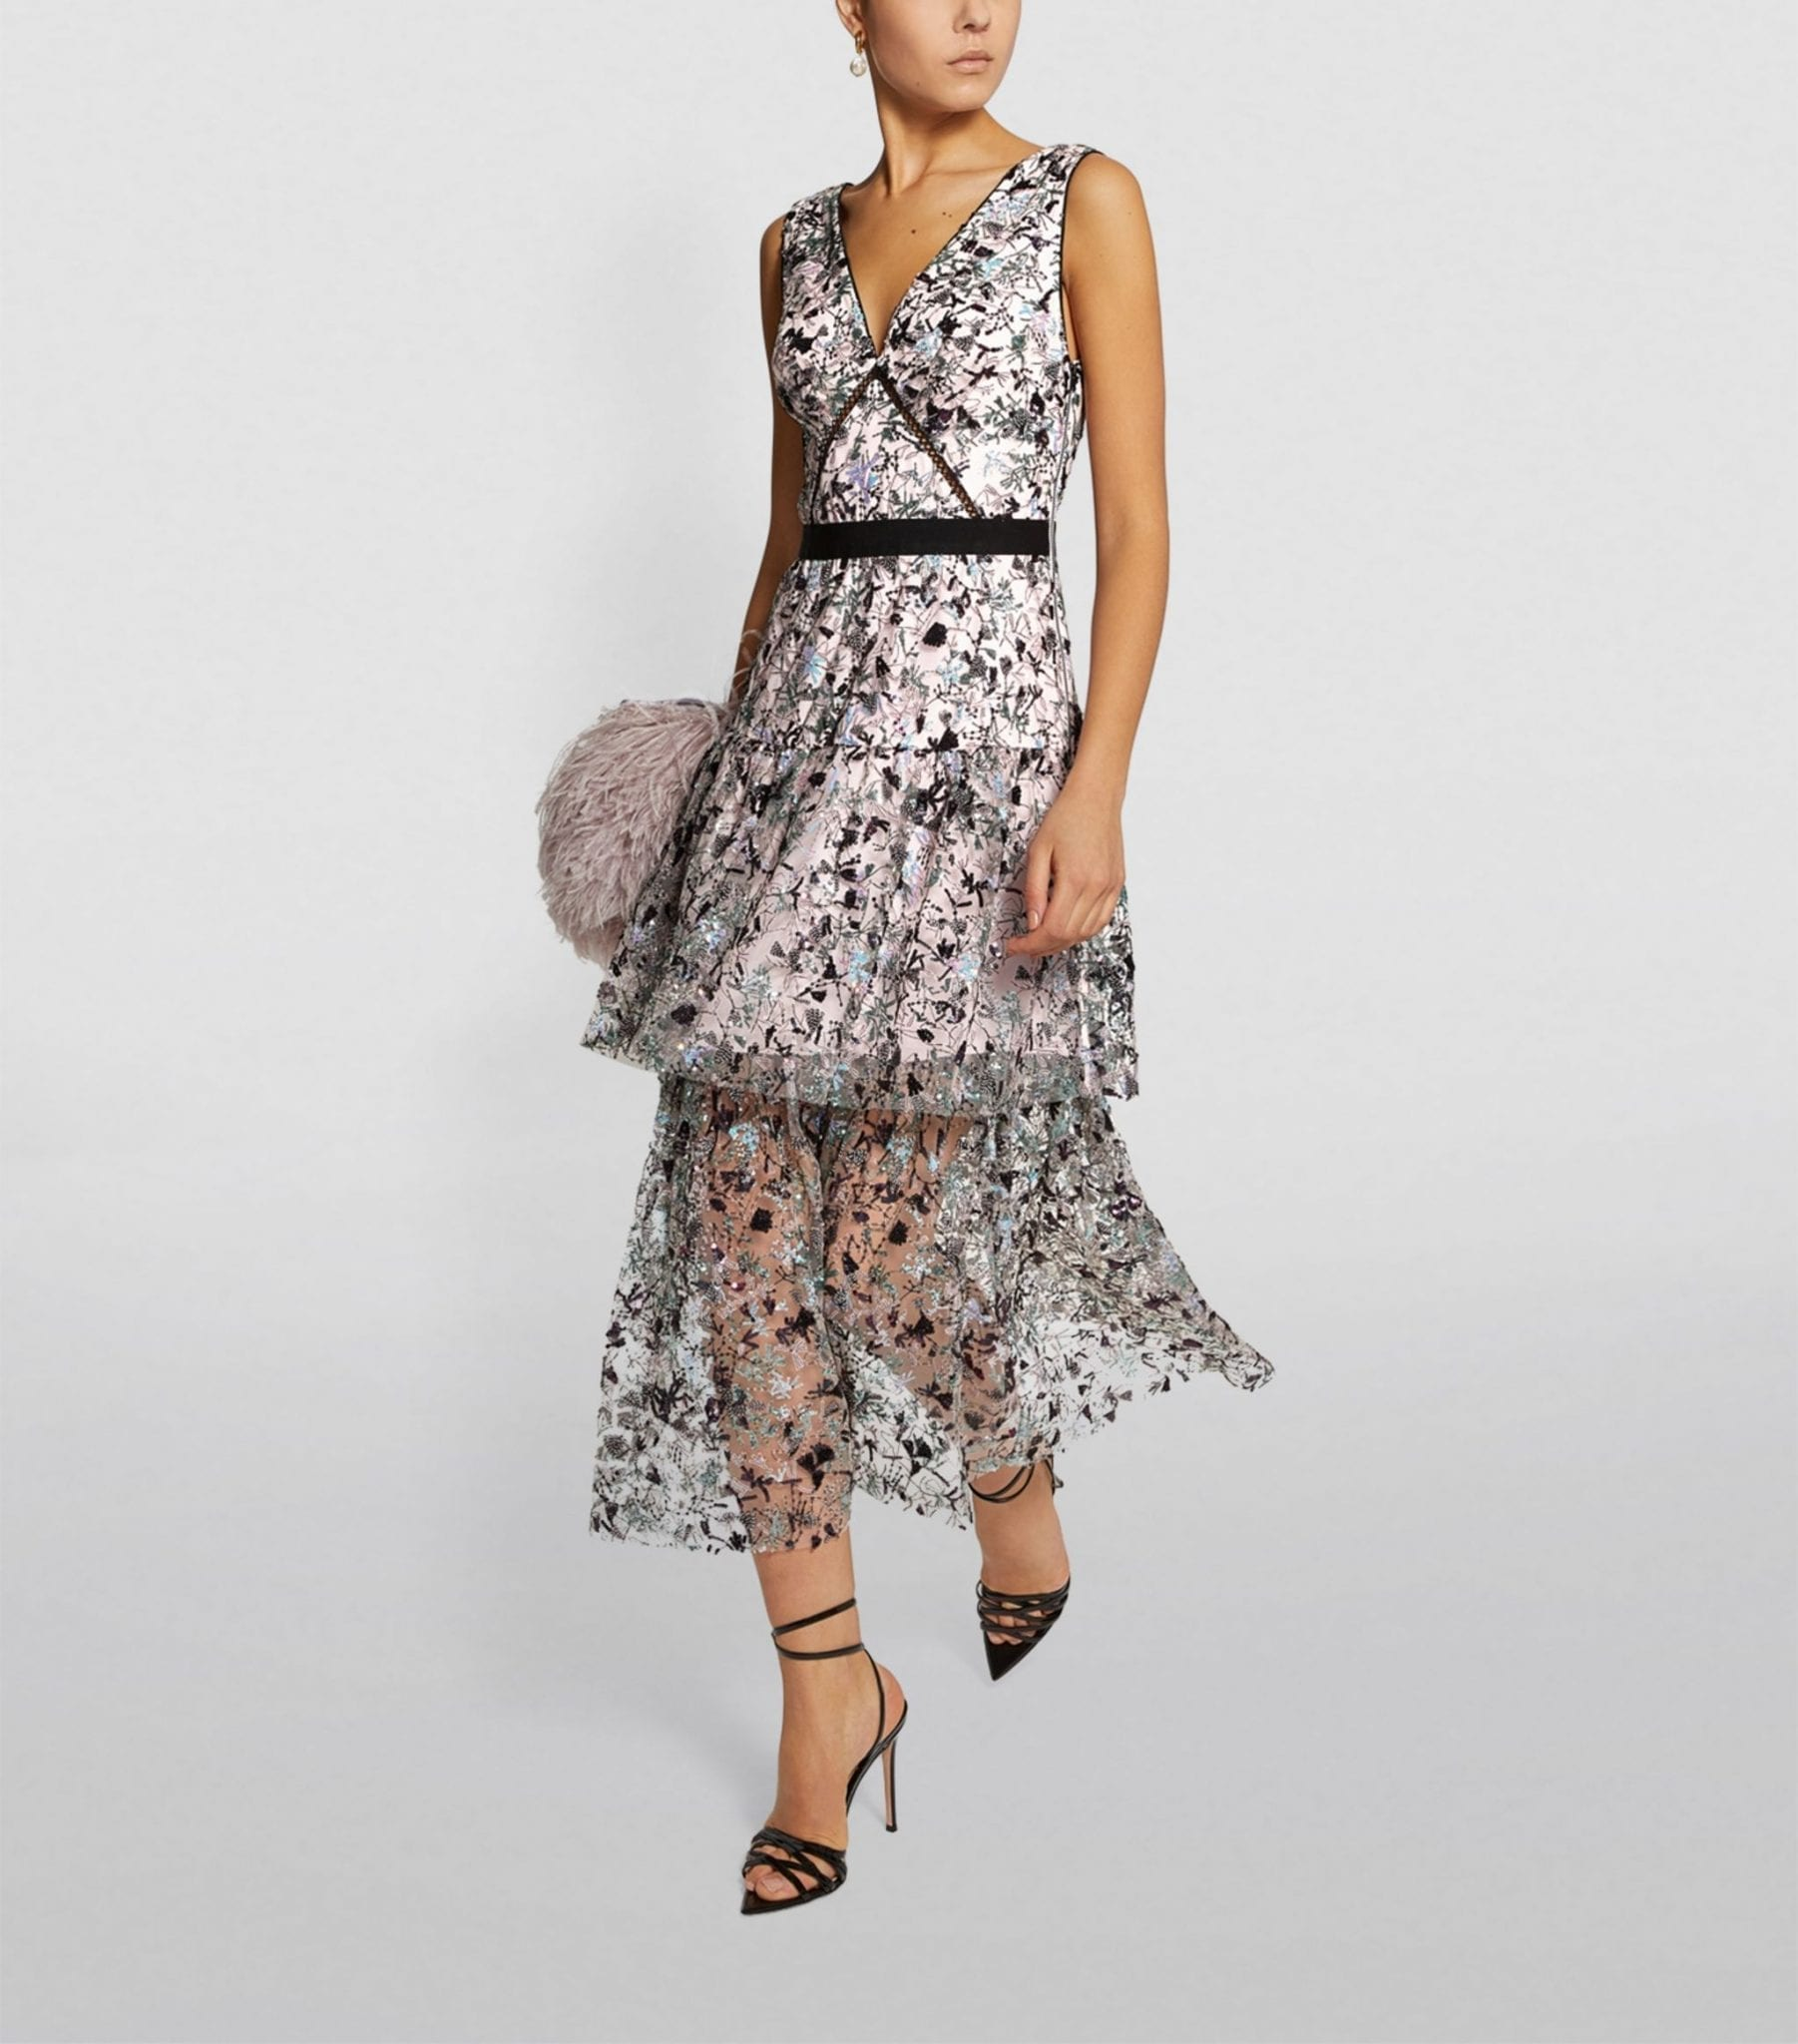 SELF-PORTRAIT Constellation Sequin Midi Dress